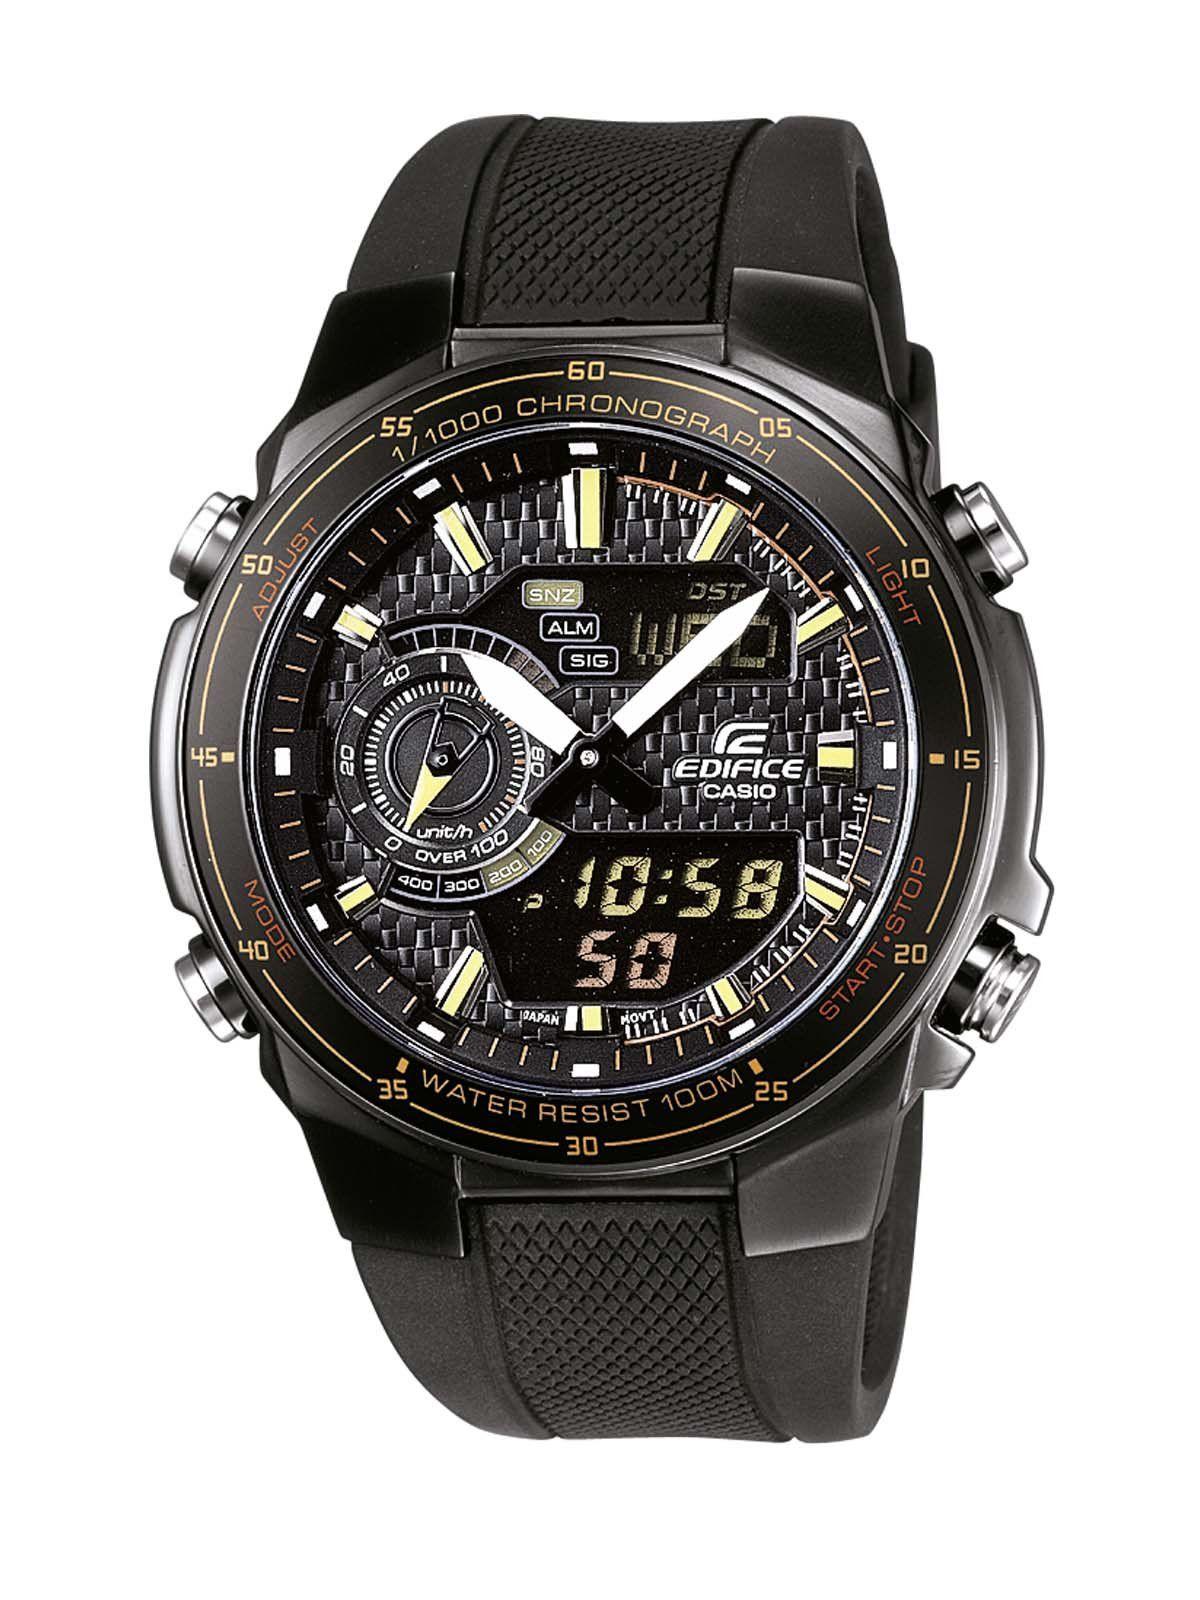 51c48dadfdb3 CASIO EFA-131PB-1AVEF - Reloj de caballero de cuarzo